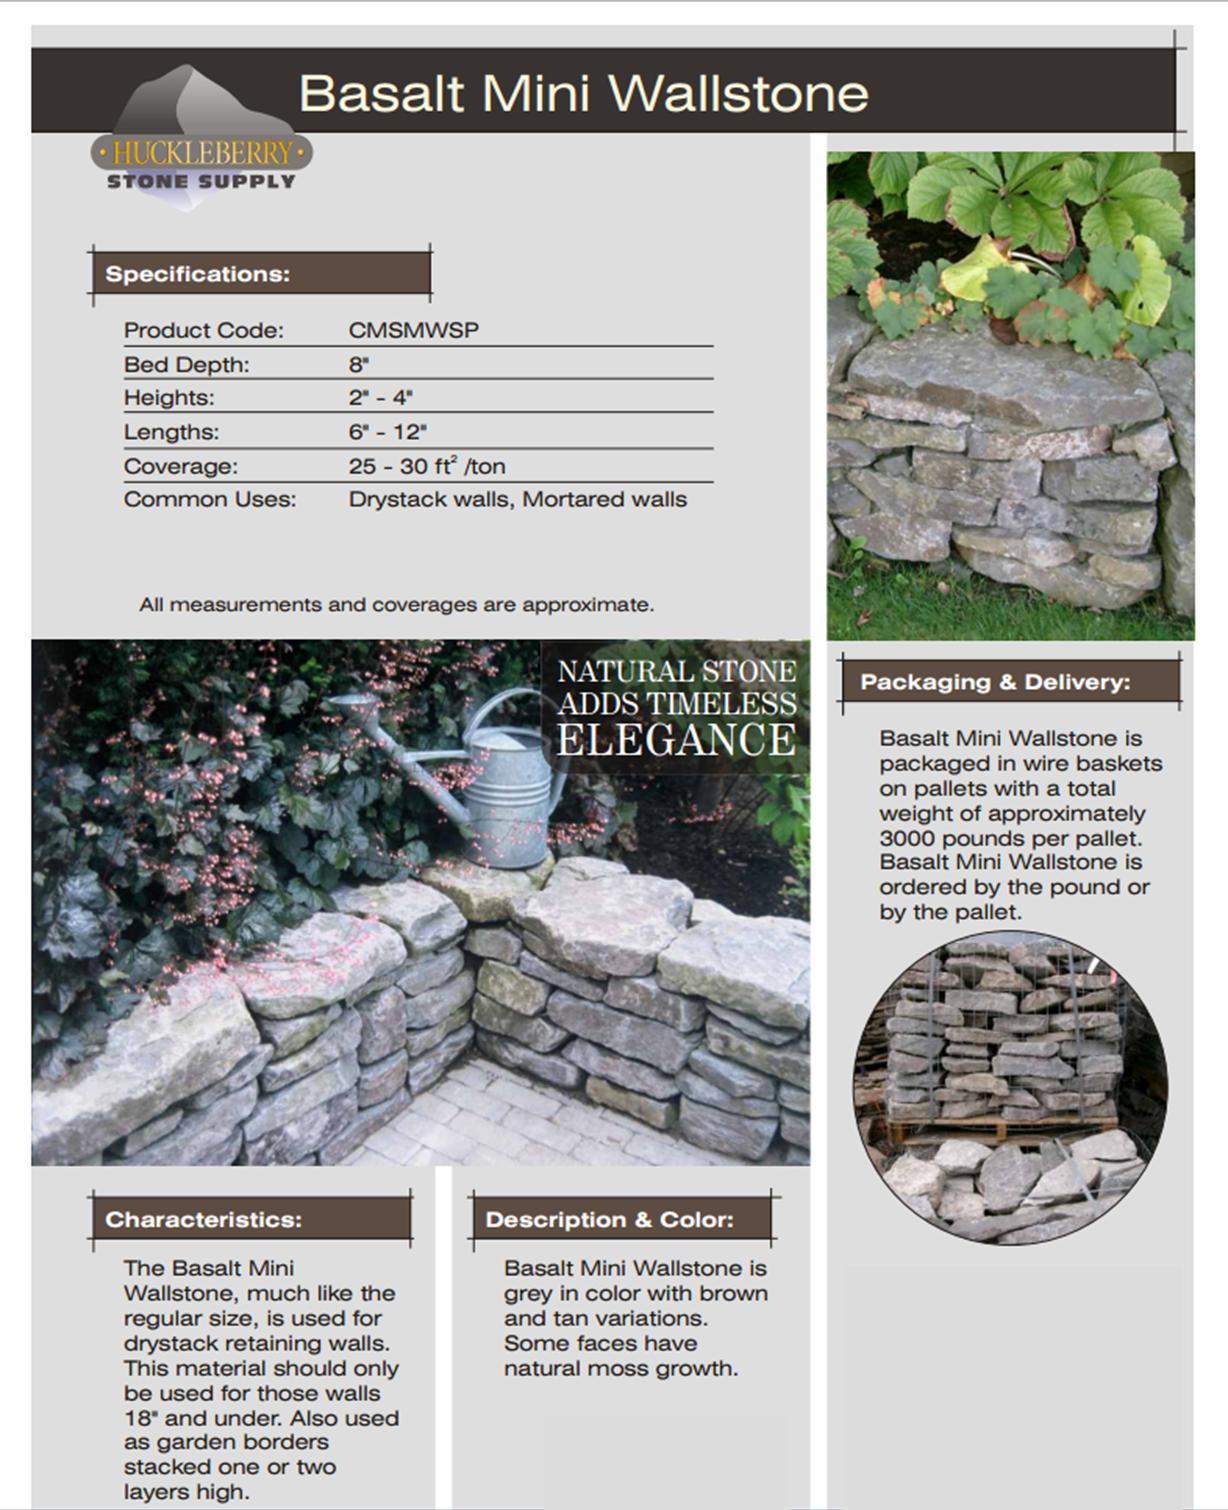 Huckleberry Mini Wallstone spec sheet